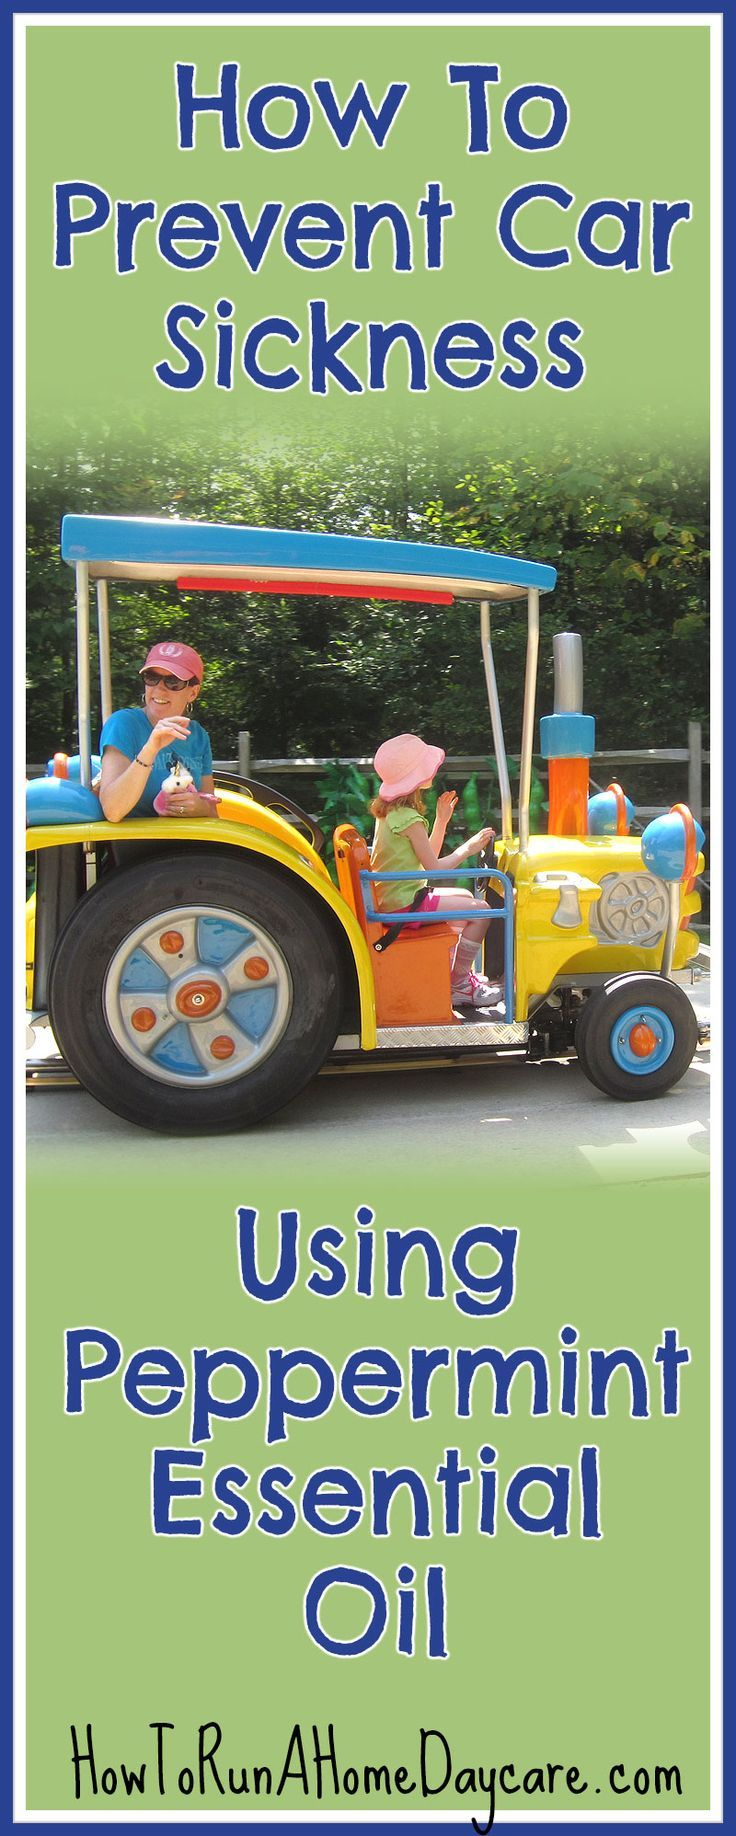 How To Prevent Car Sickness Using Peppermint Essential Oil Car Sick Essential Oils For Kids Motion Sickness Essential Oils